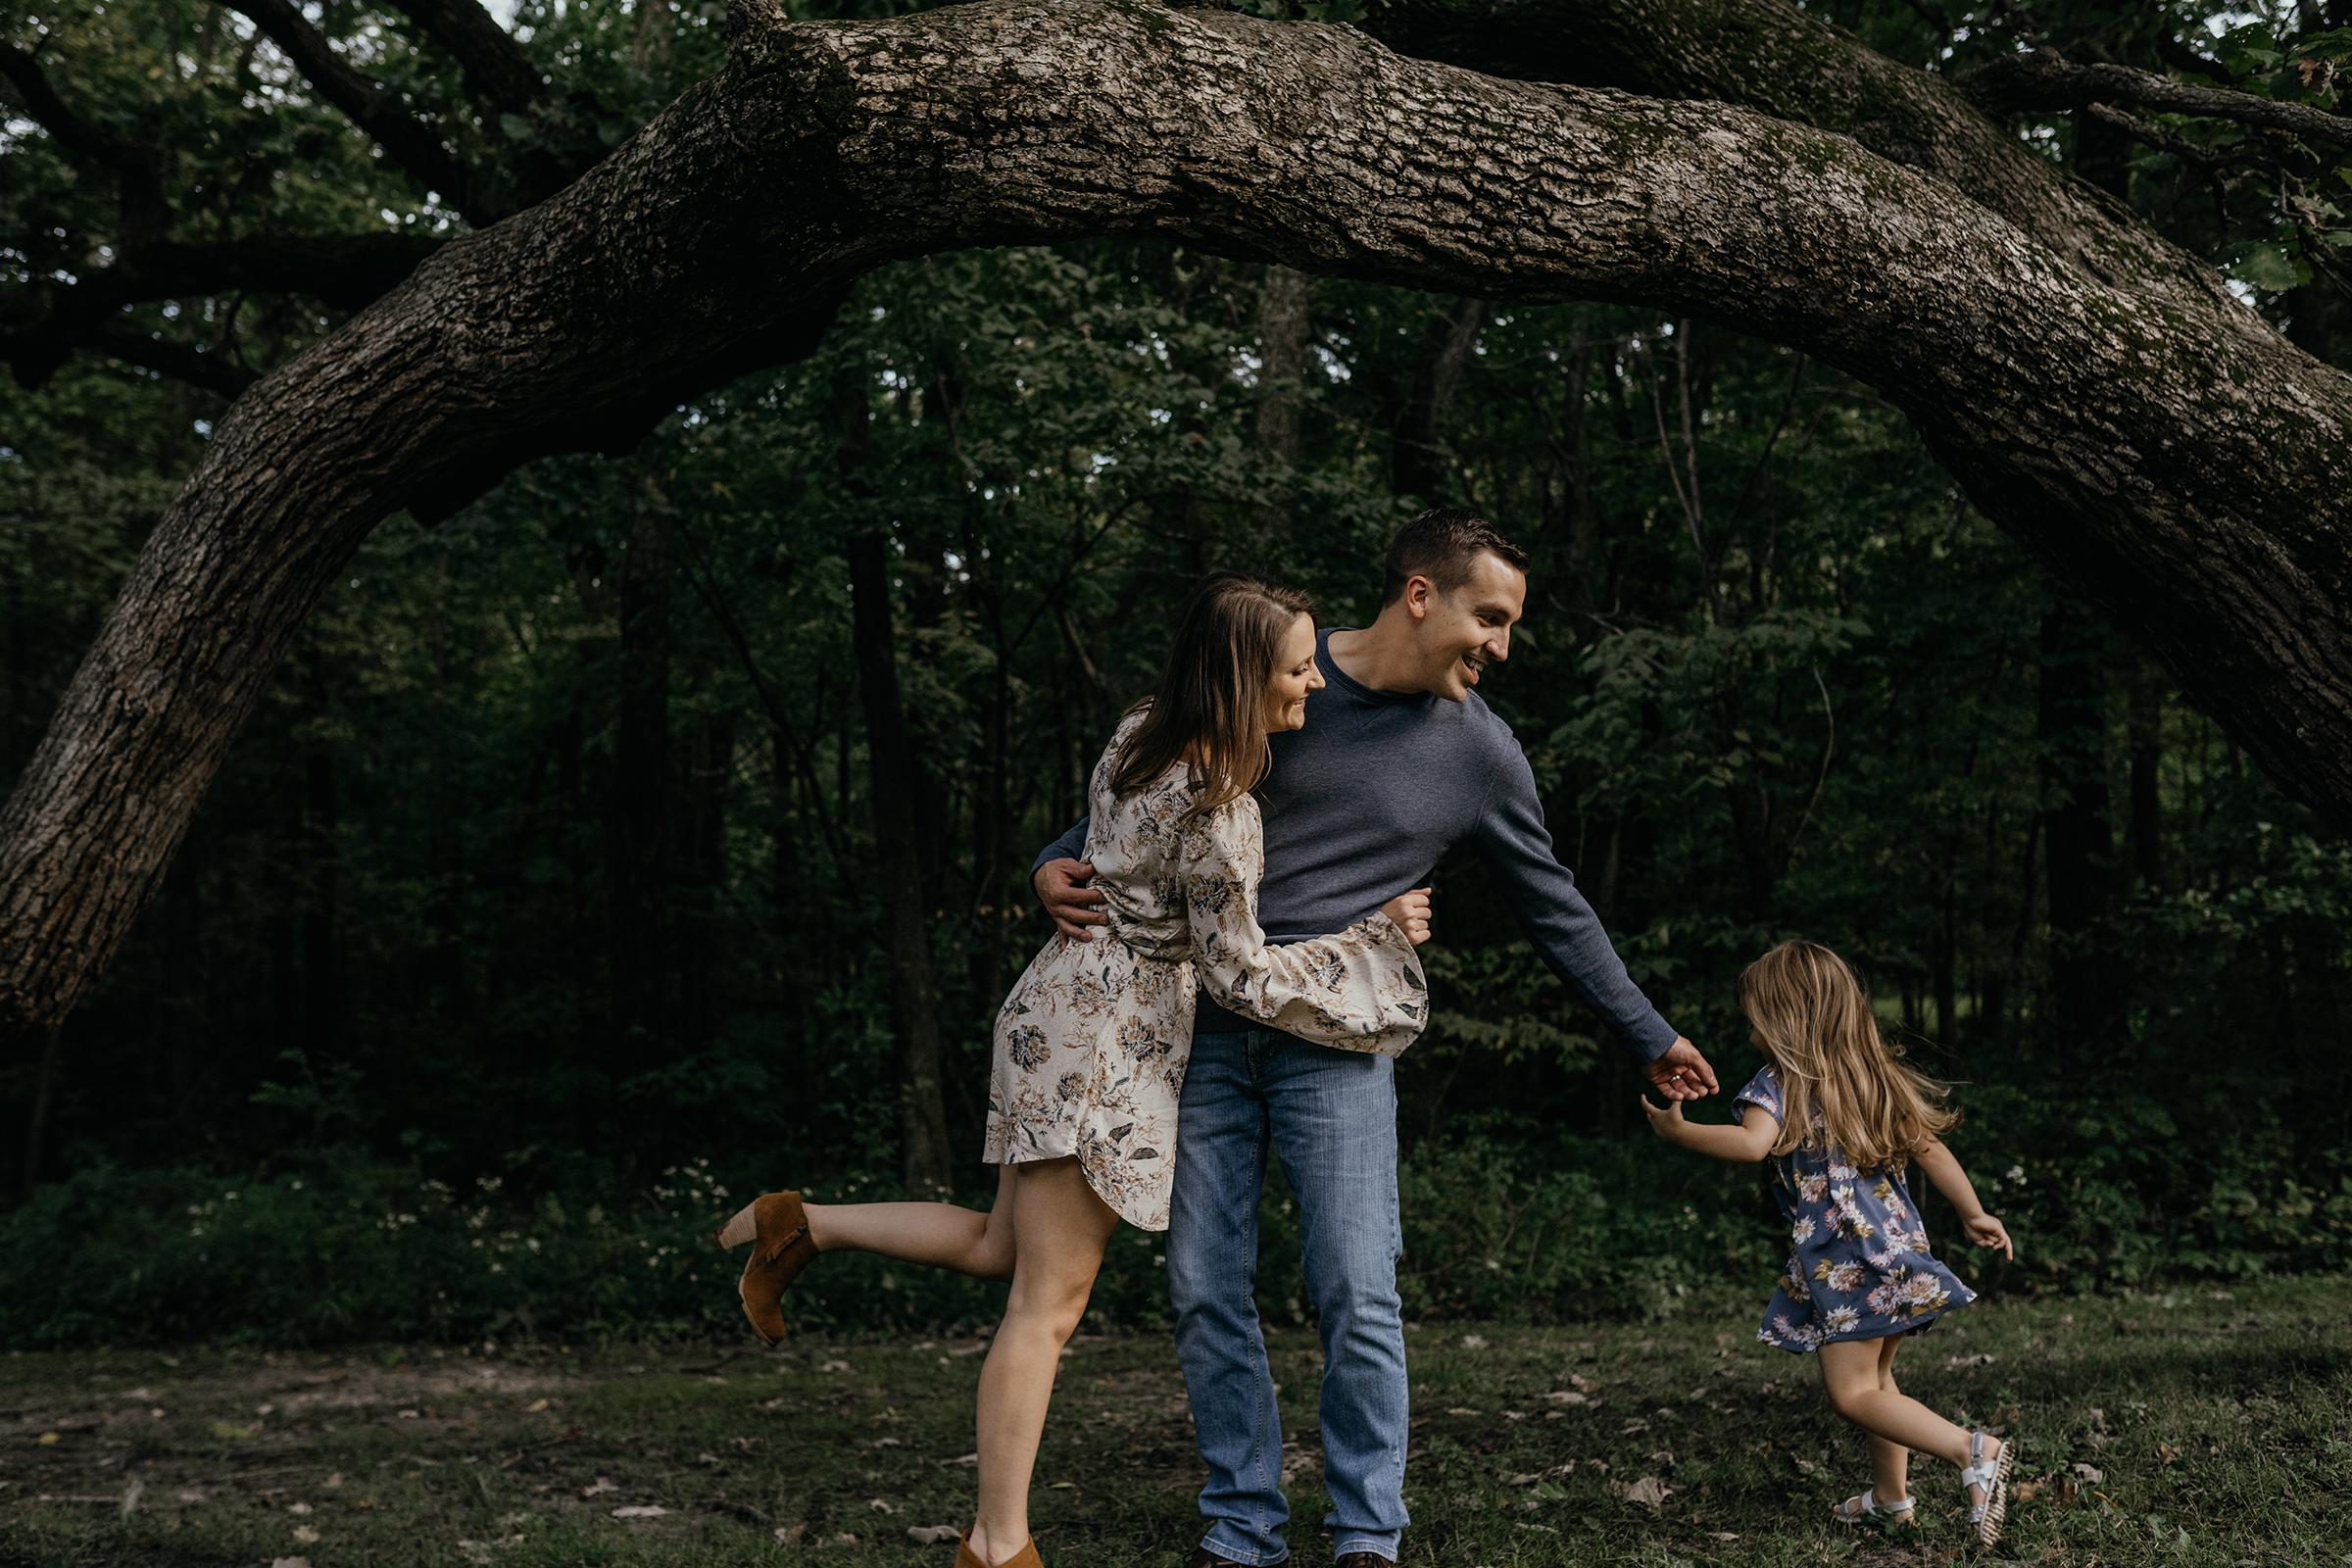 mueller-family-daughter-running-around-parents-granger-iowa-raelyn-ramey-photography.jpg